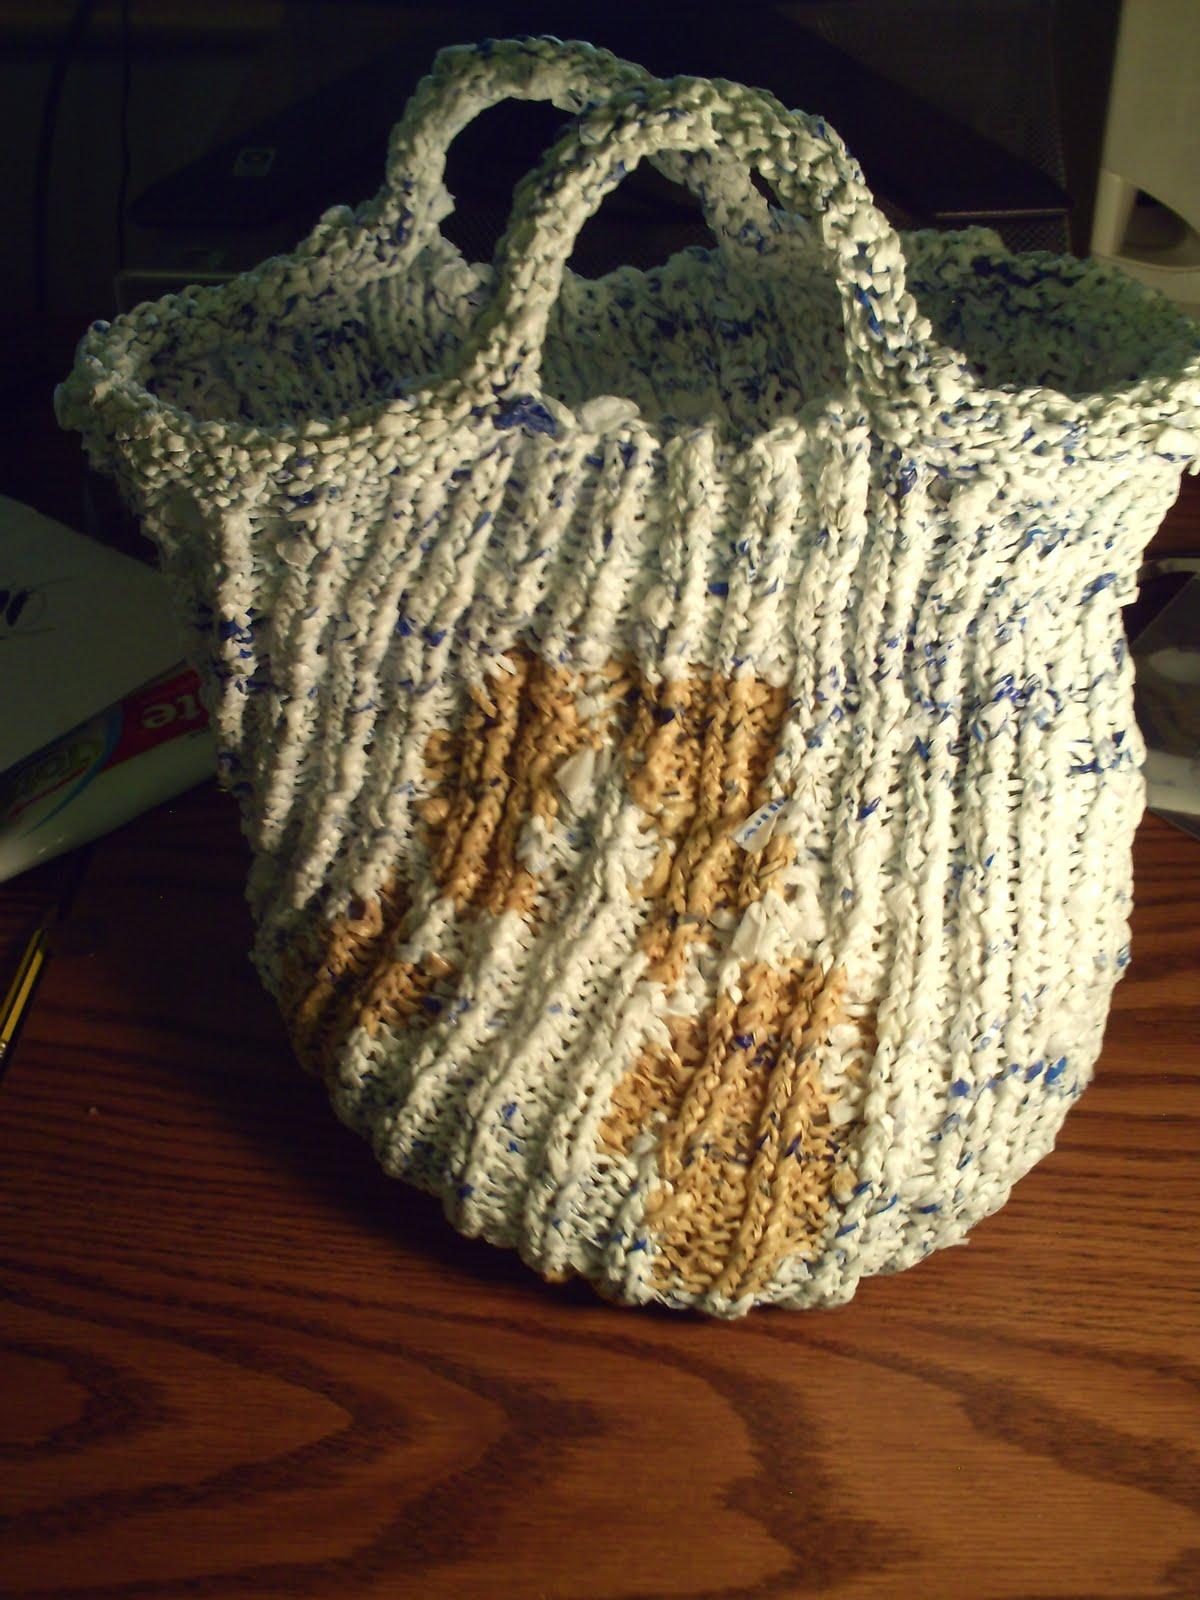 Garden Of Forking Paths Plarn Knit Bag Pattern